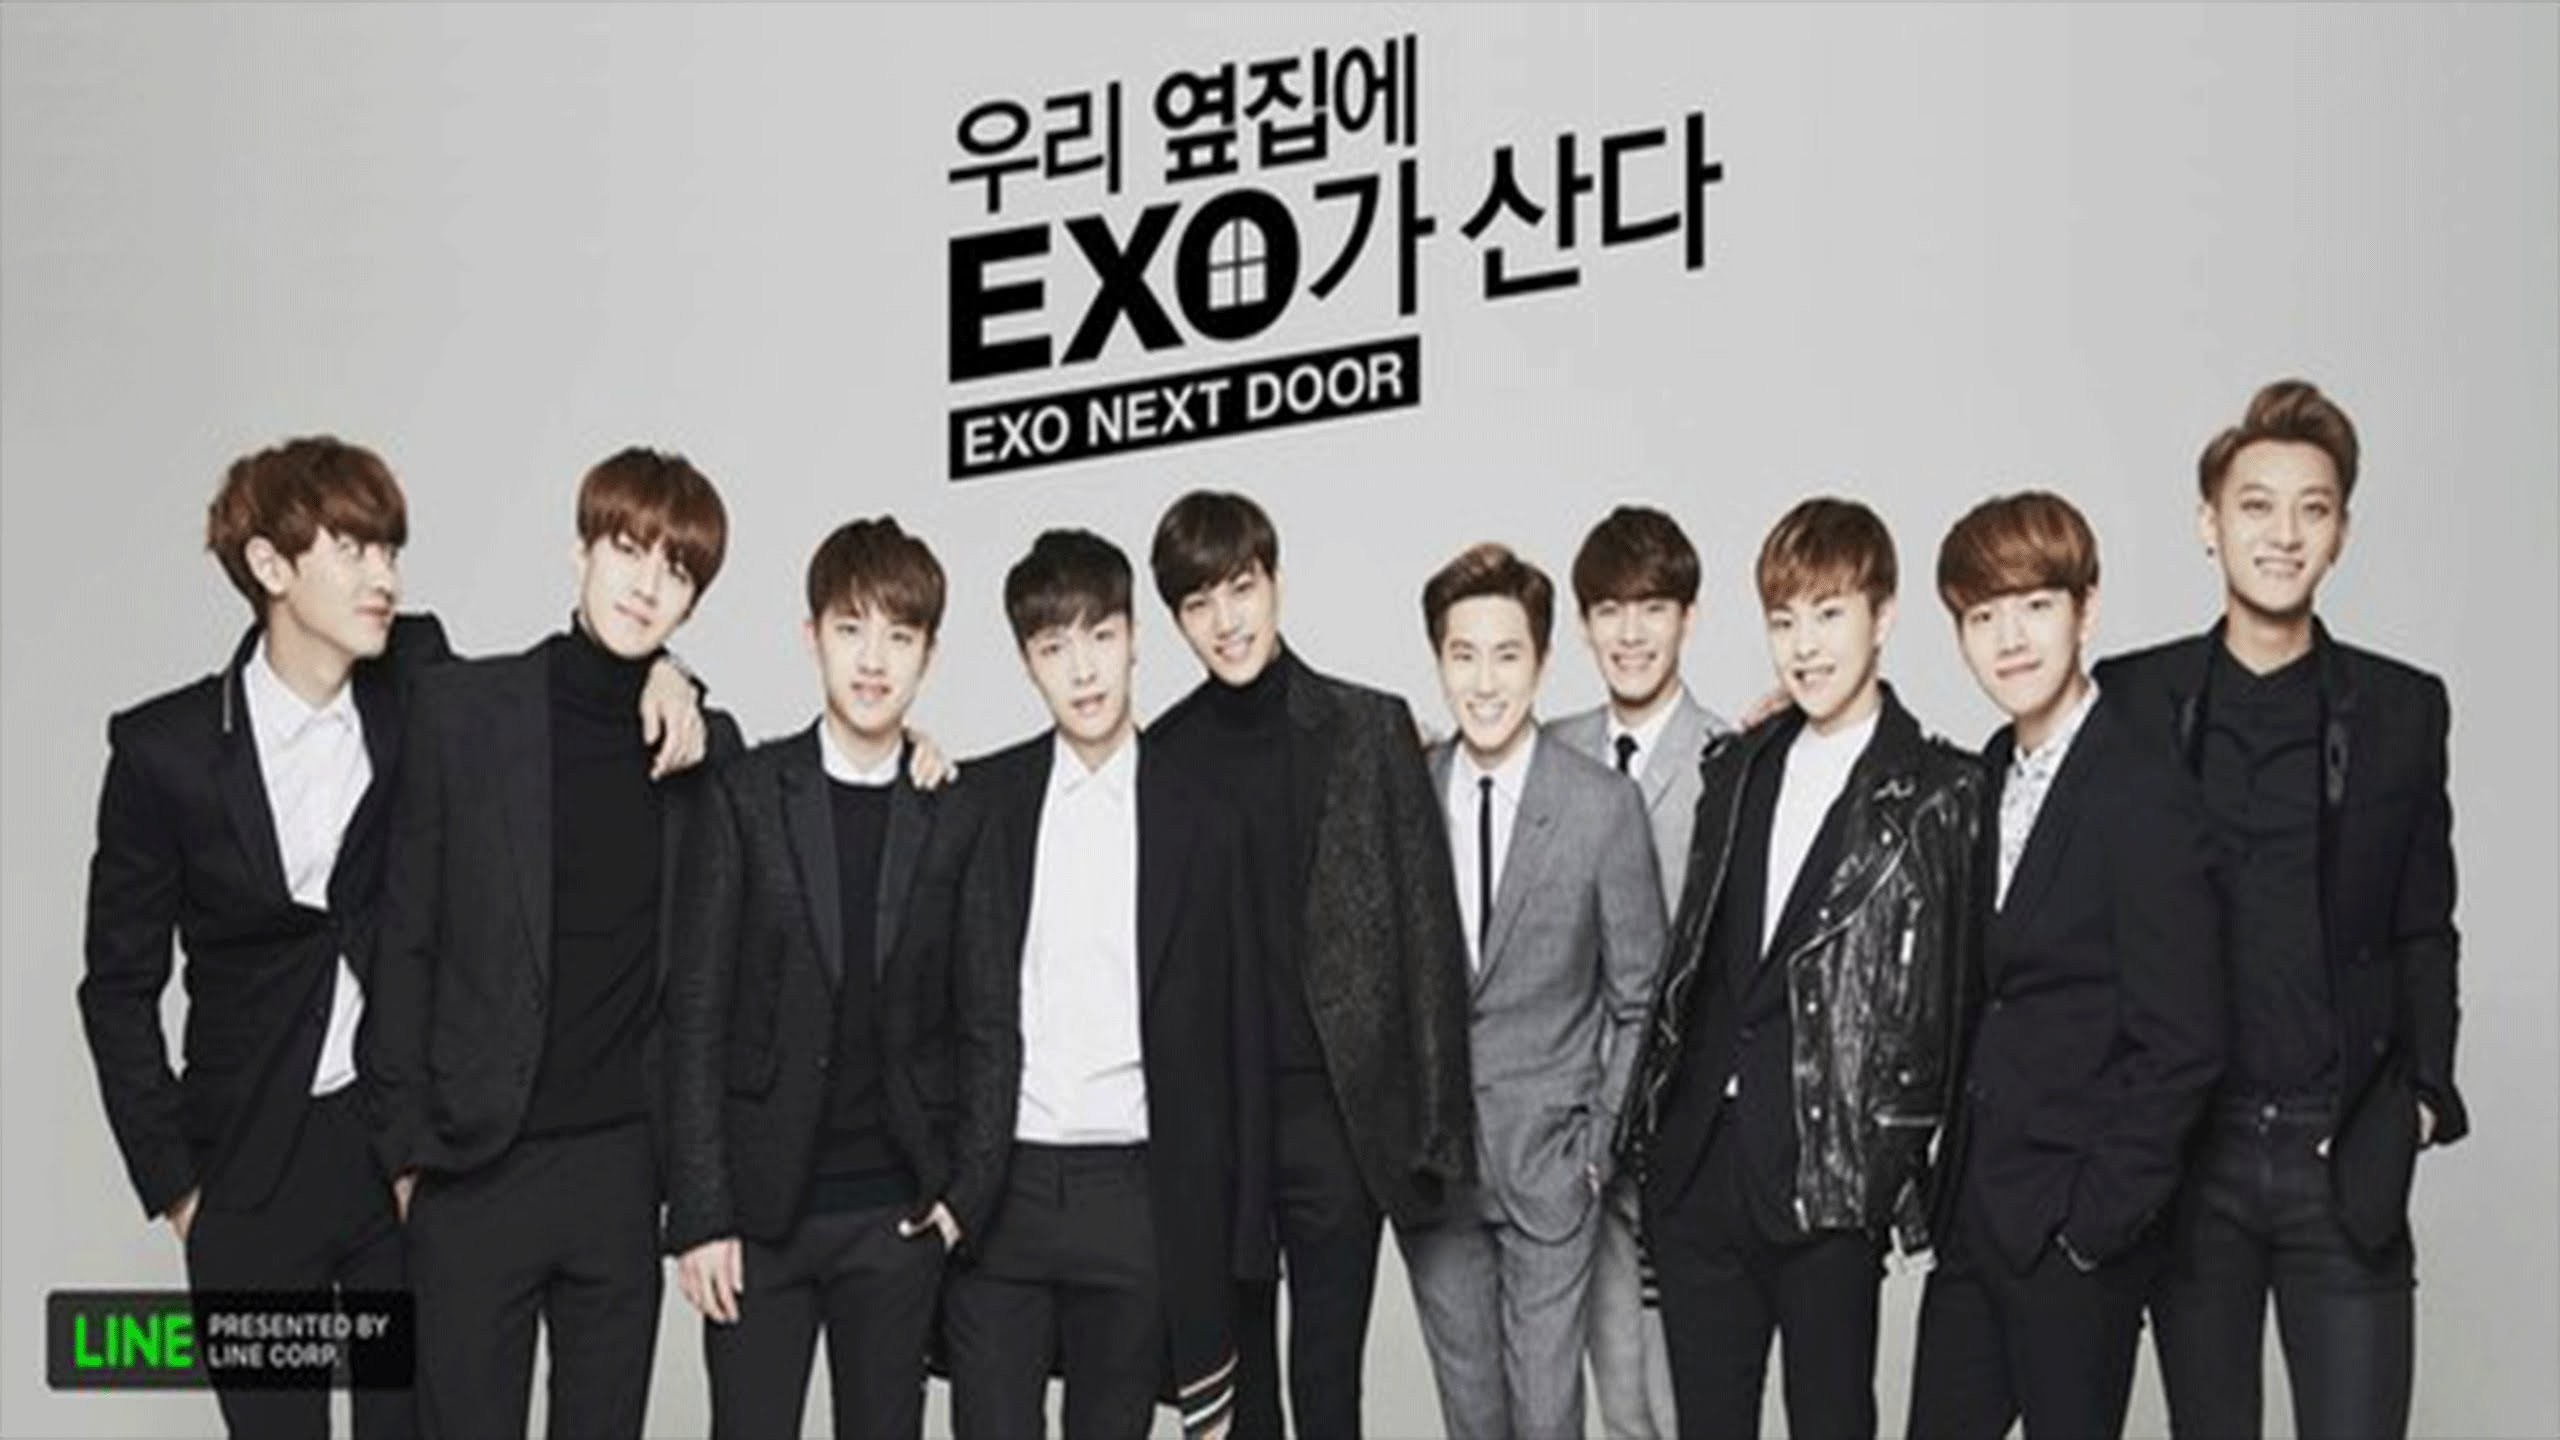 exo wallpaper 2016 8